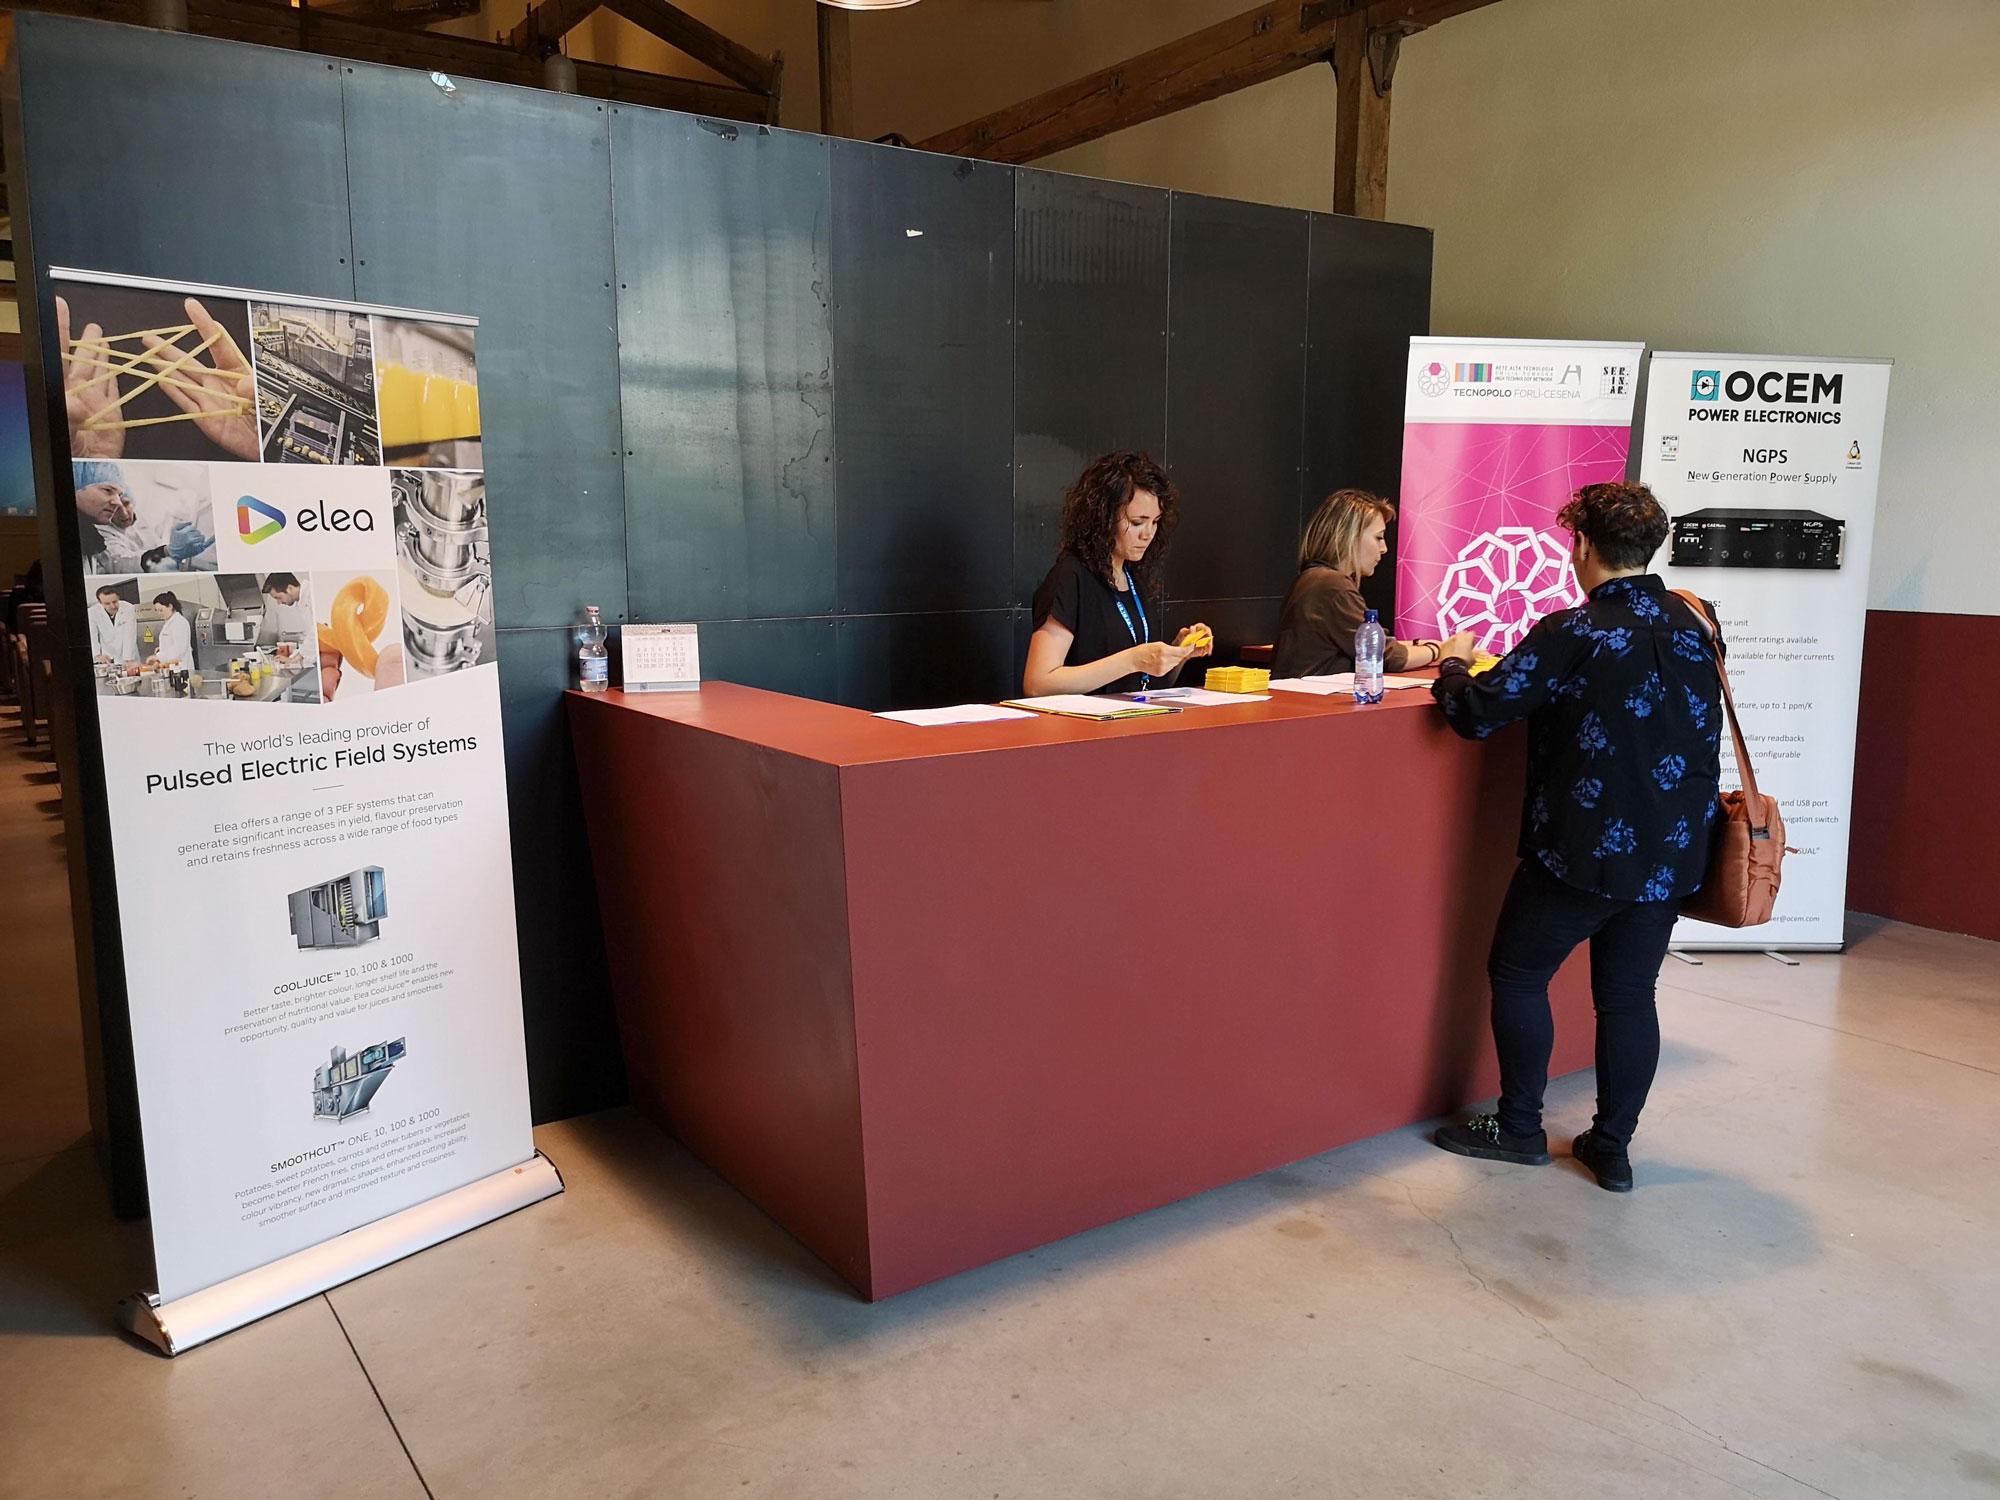 OCEM Power Electronics sponsors the 6th PEFSchool